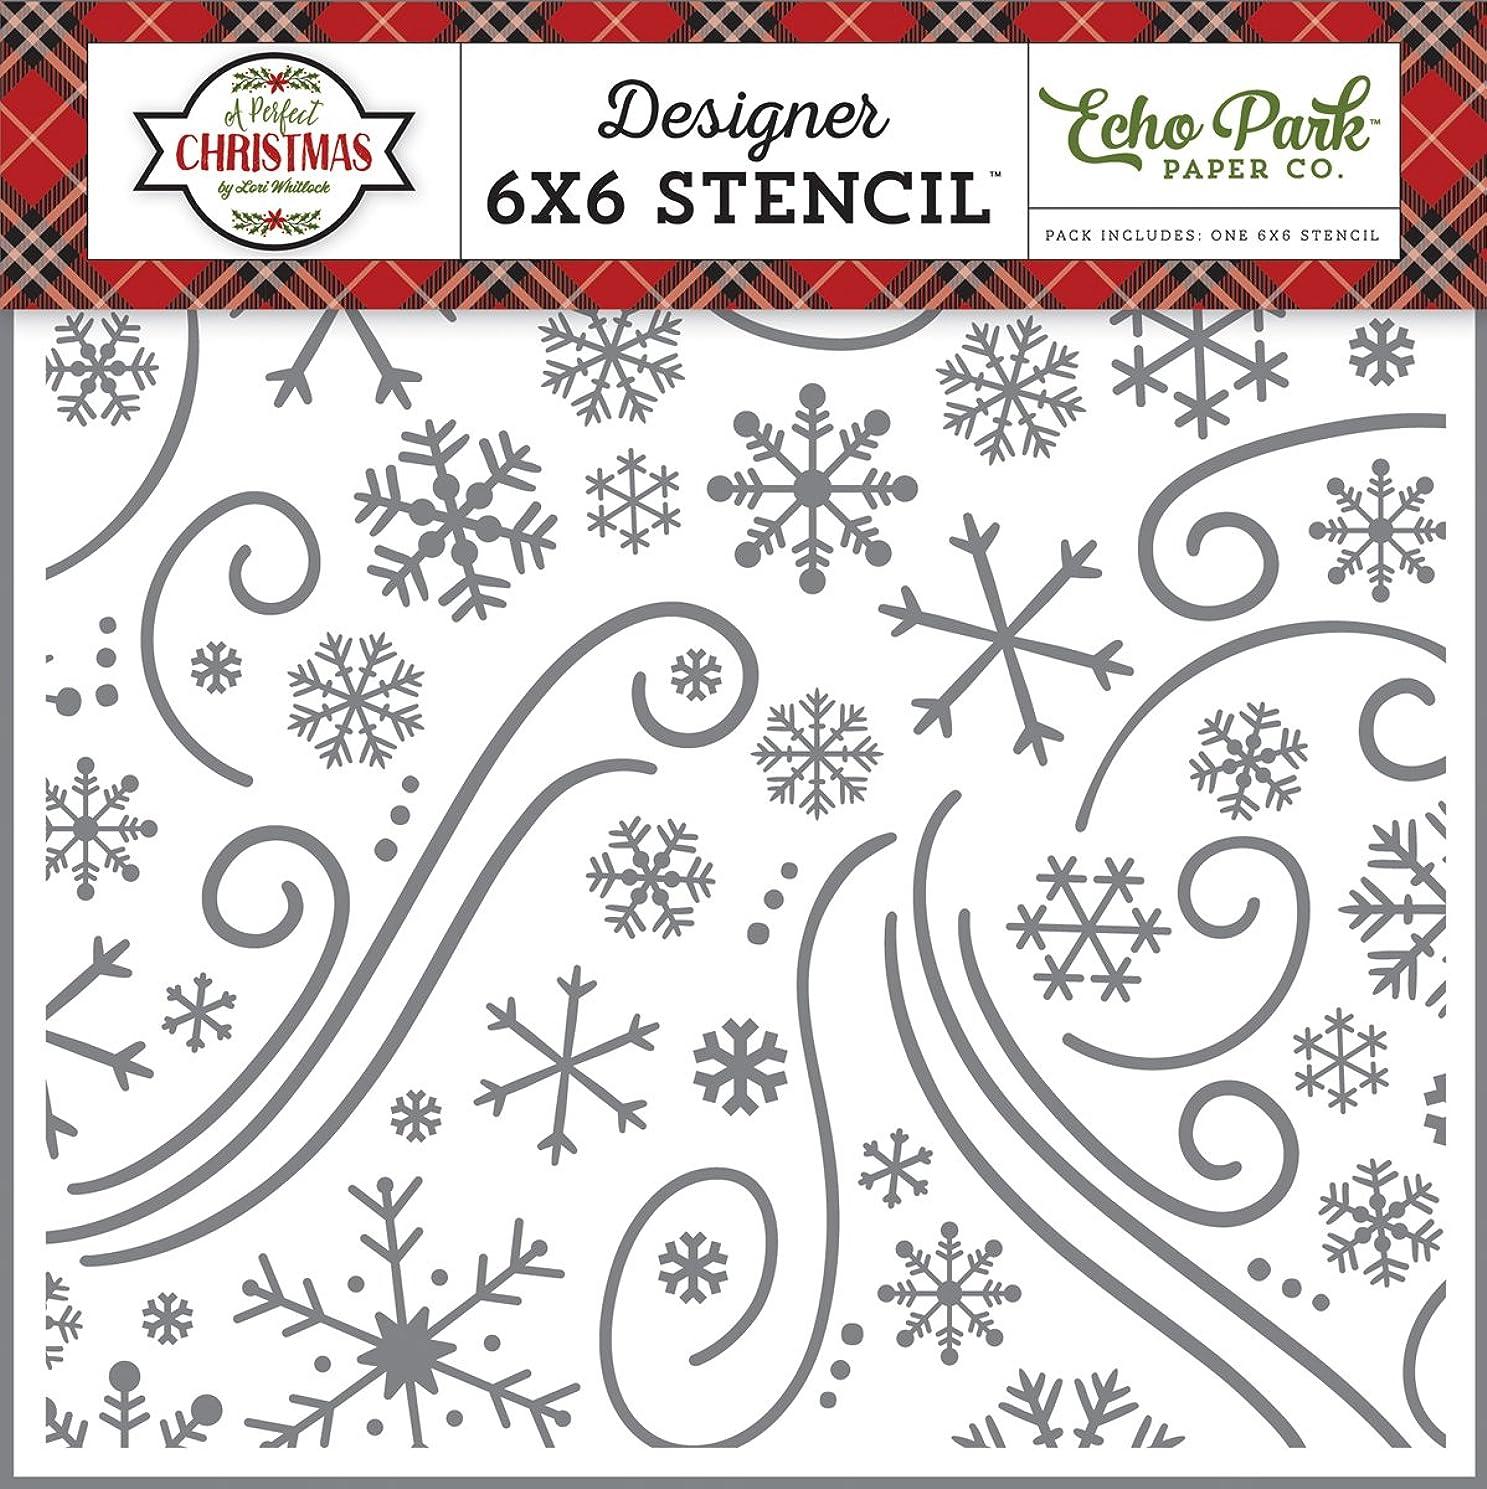 Echo Park Paper Company Christmas Wonderland Stencil